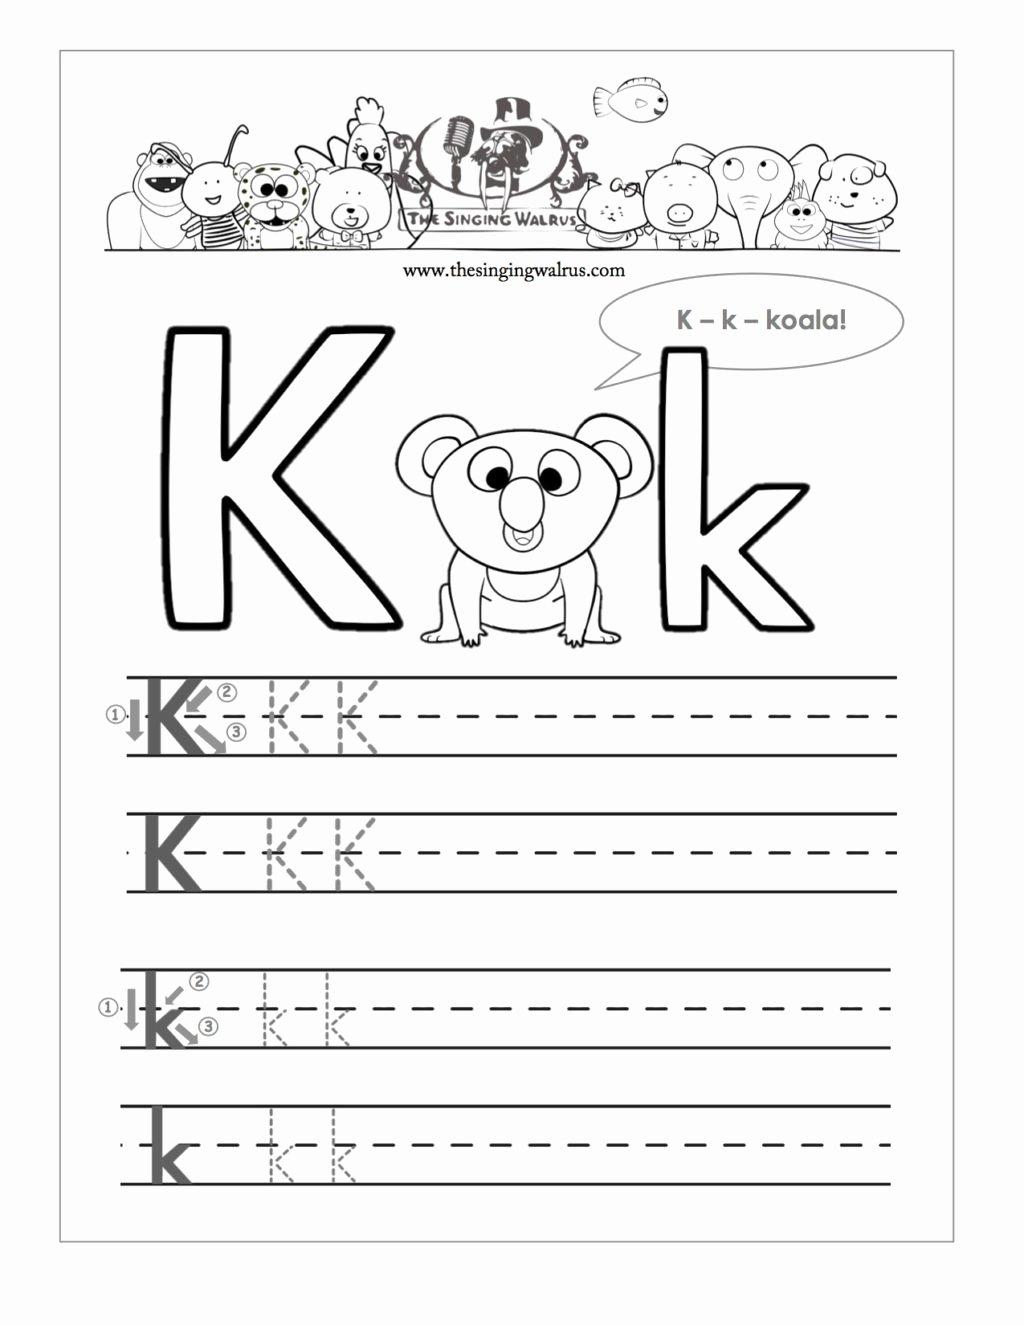 Worksheets for Preschoolers On Letters Best Of Worksheet Free Printable Letter K Barka astonishing